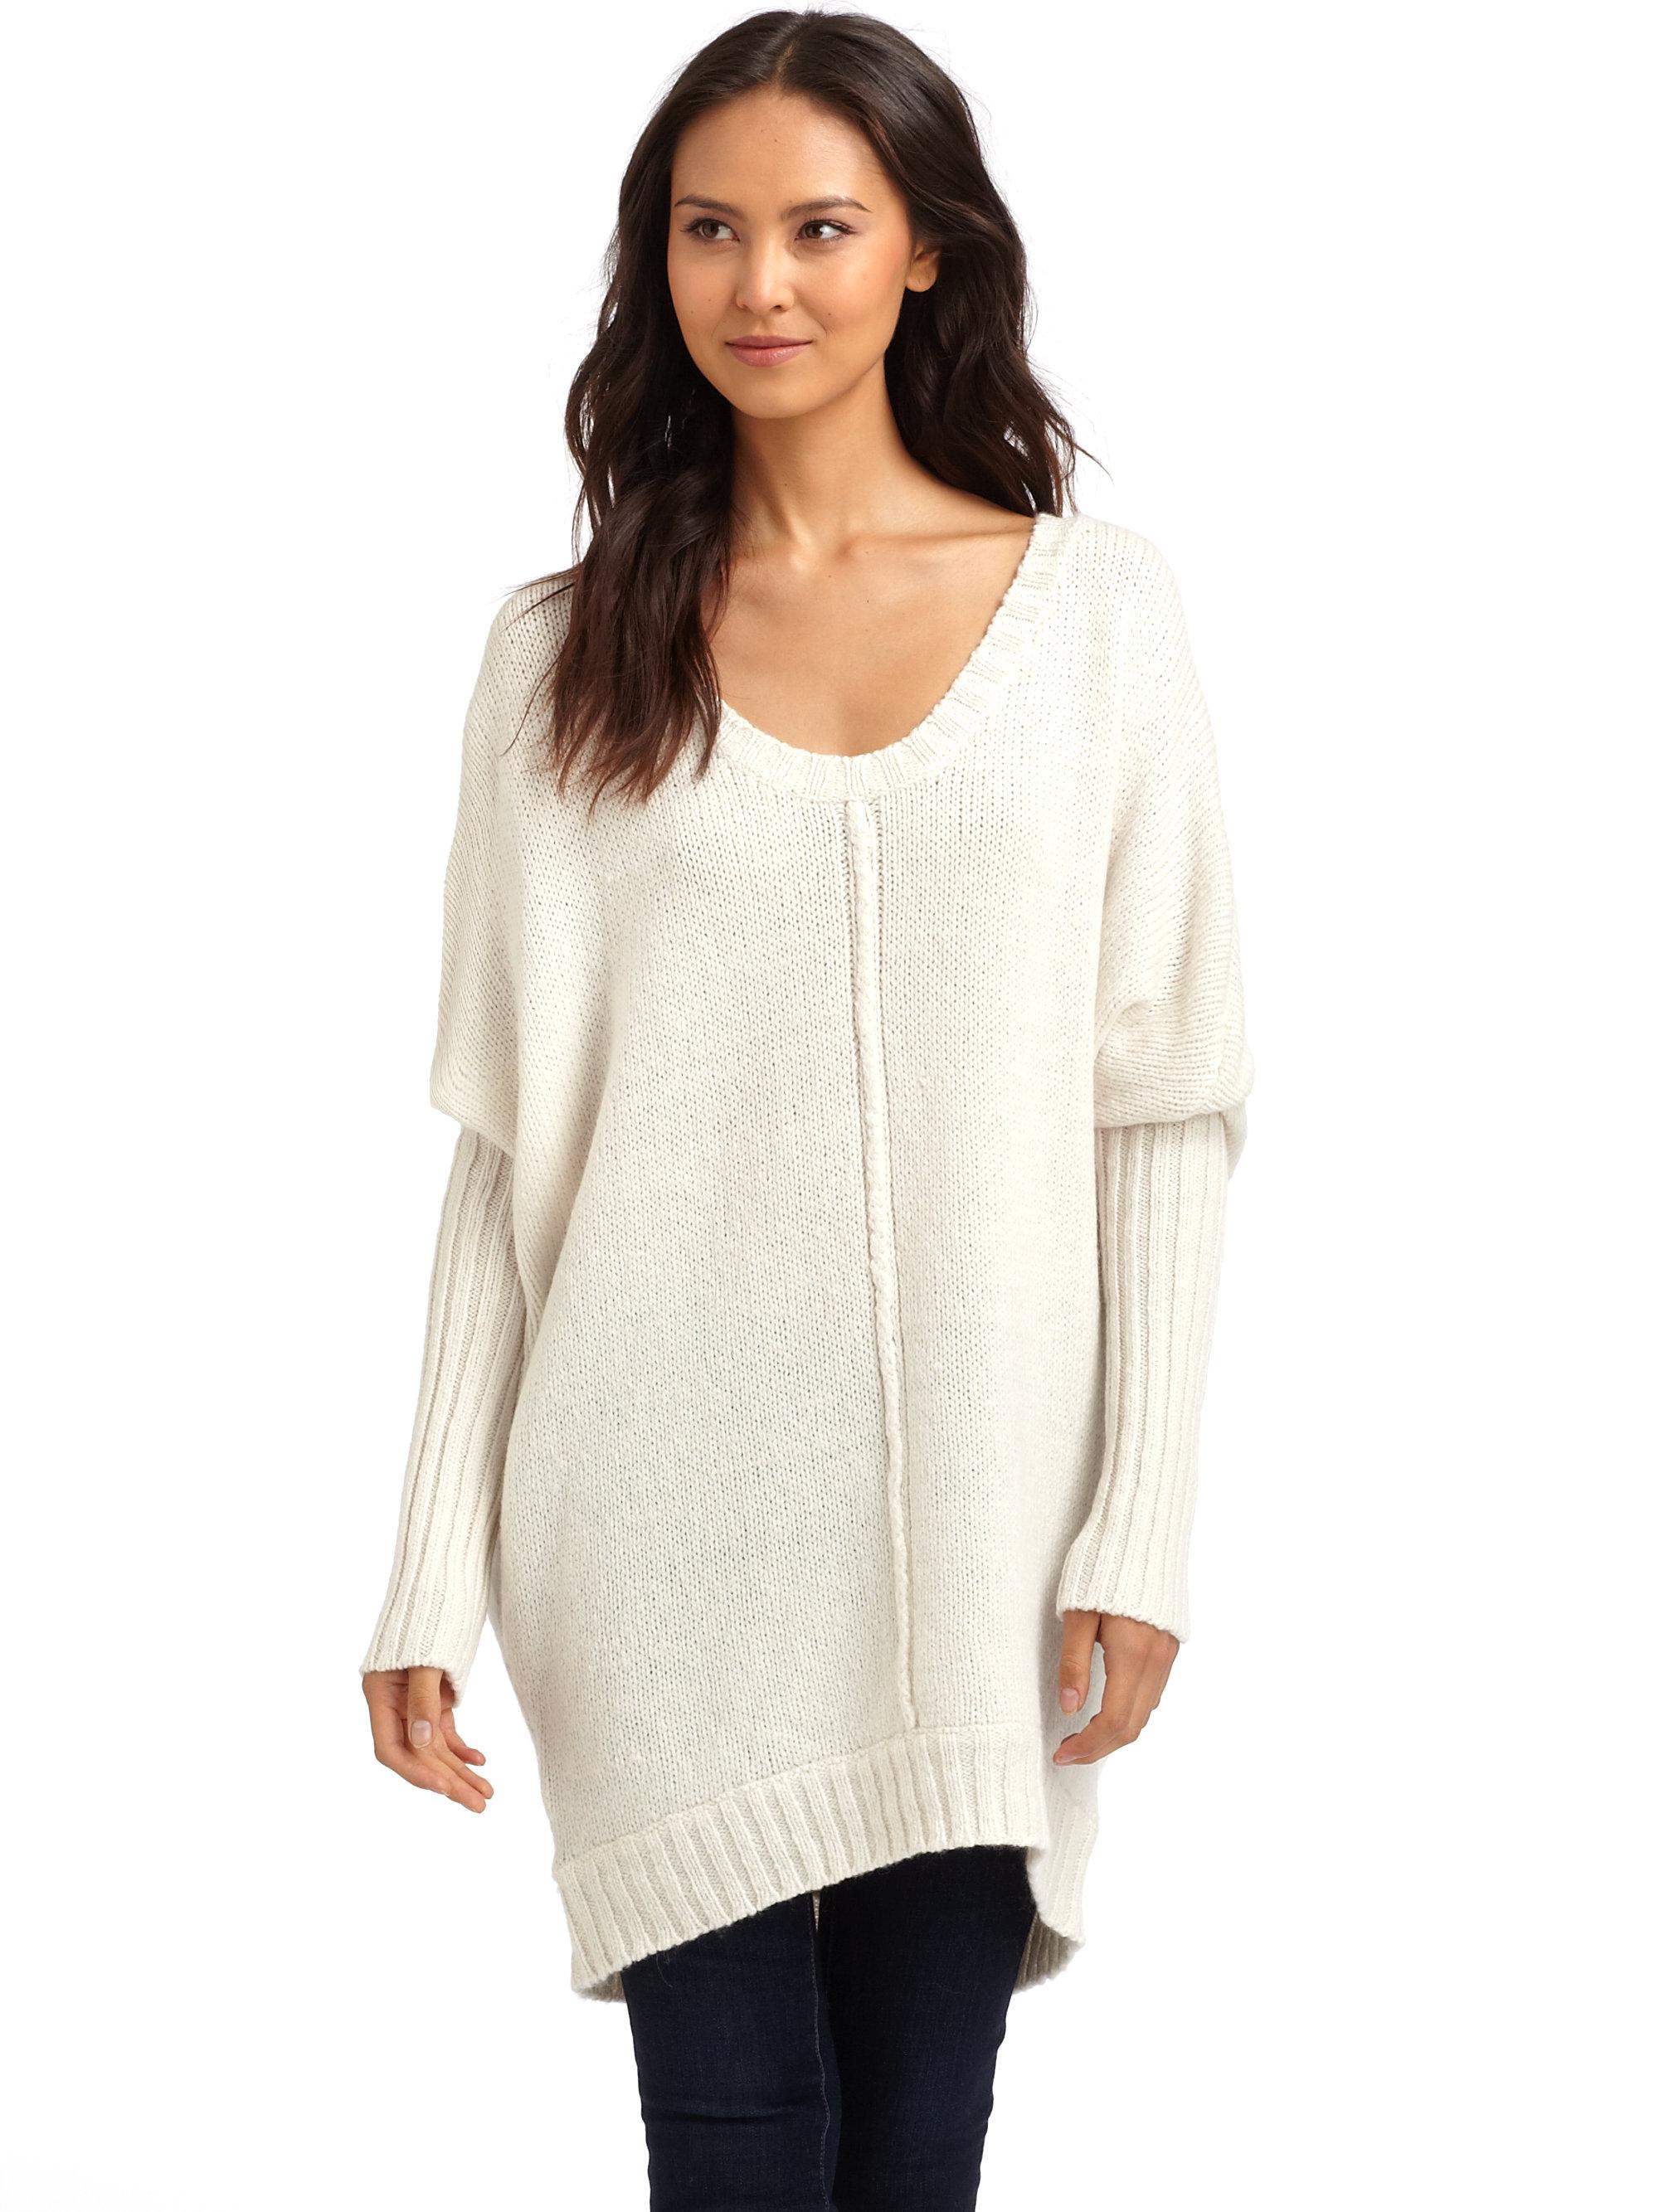 Bcbgmaxazria Oversized Sweater in Natural | Lyst